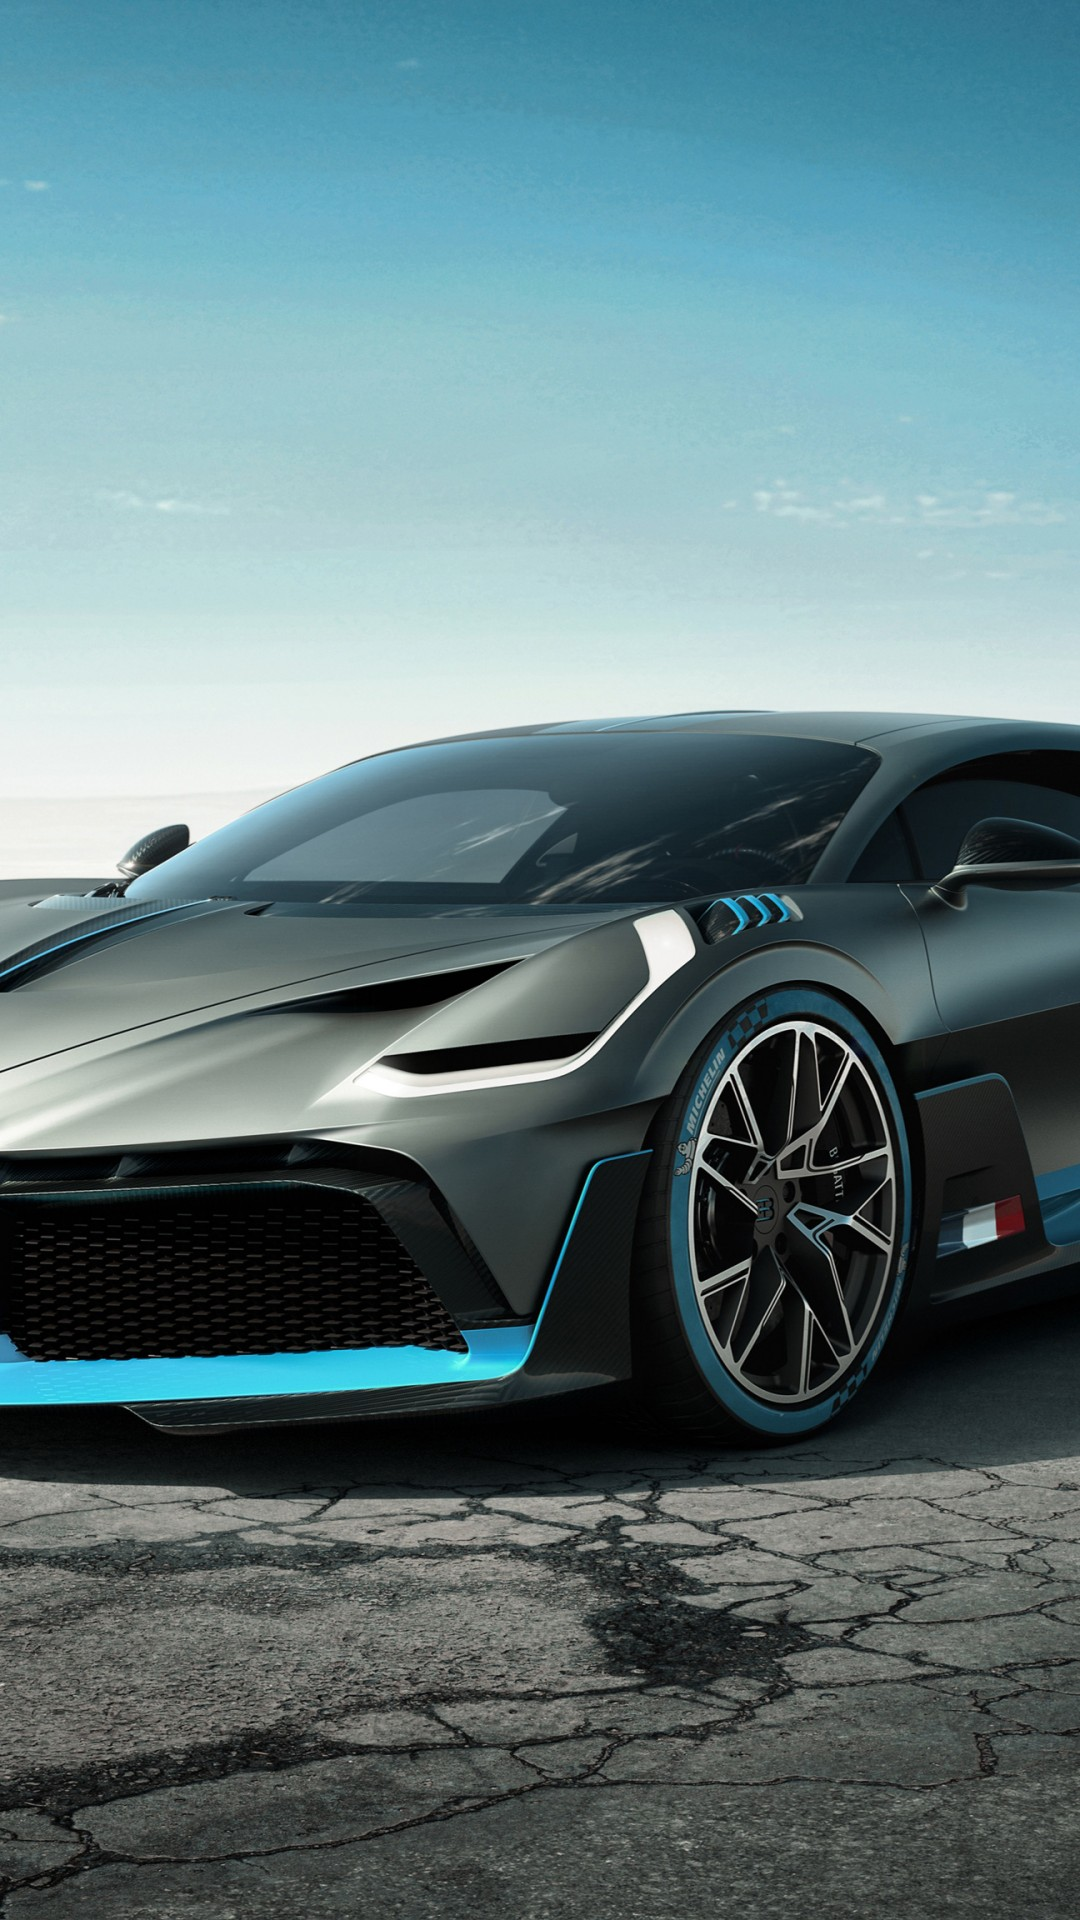 Wallpaper Bugatti Divo 2019 Cars Supercar 4k Cars Amp Bikes 20167